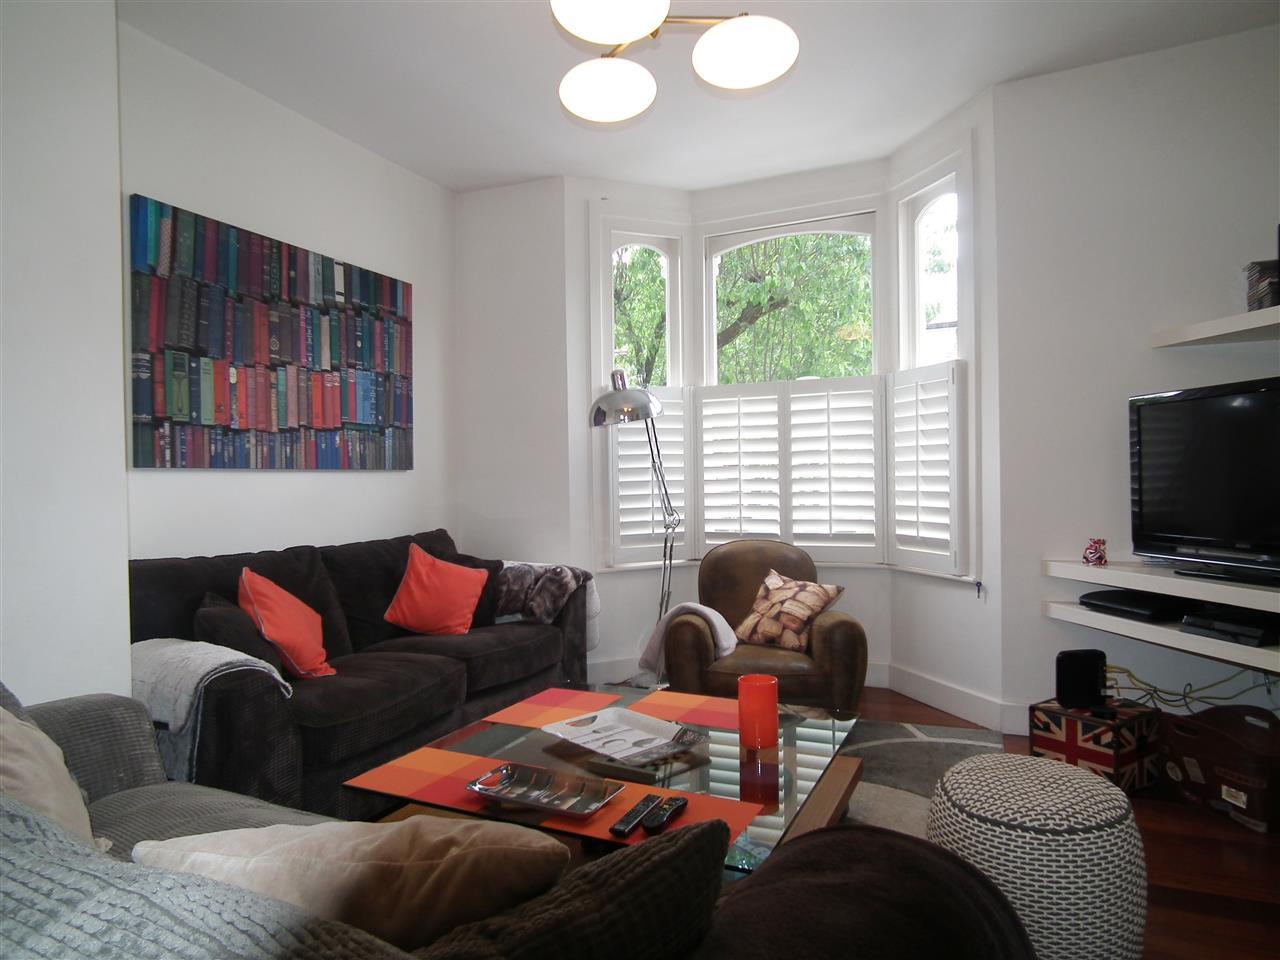 3 bed flat to rent in Hugo Road, London, N19